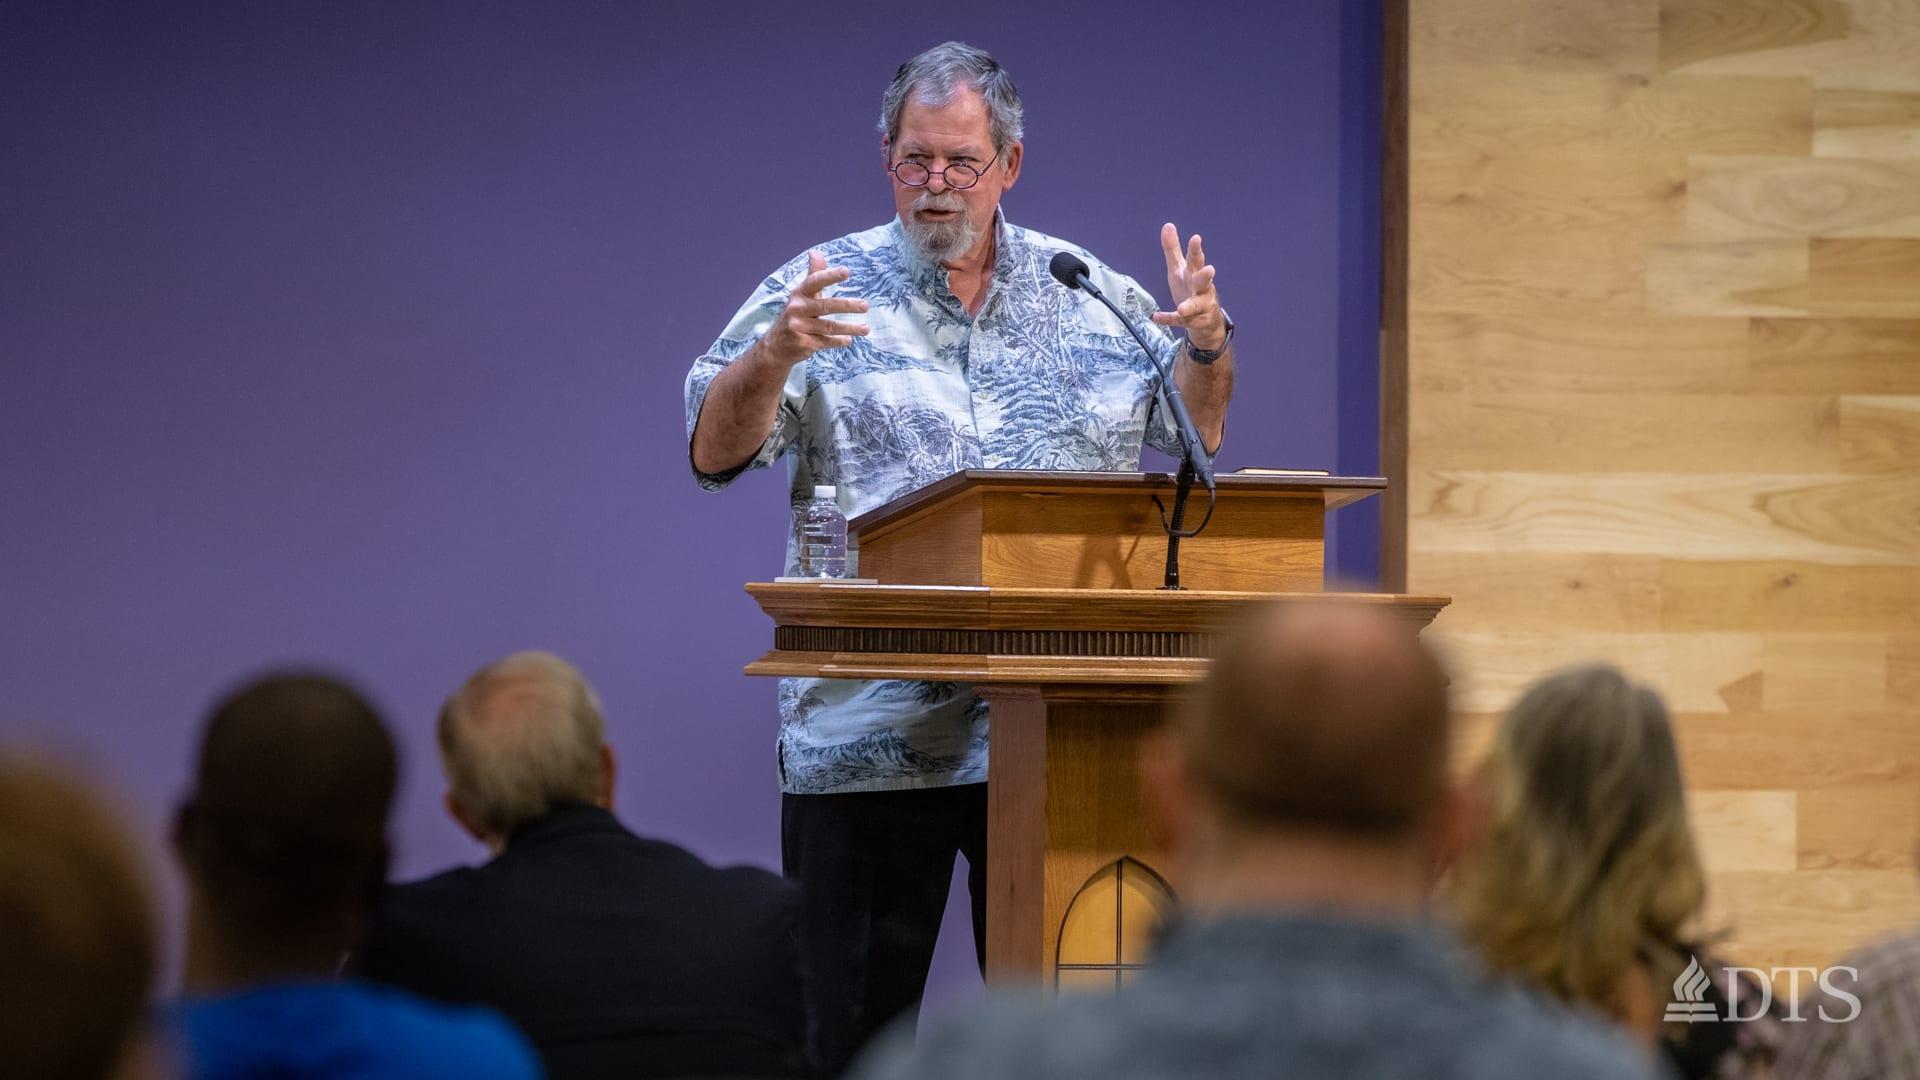 Dr. Daniel Wallace, senior research professor of New Testament Studies at DTS